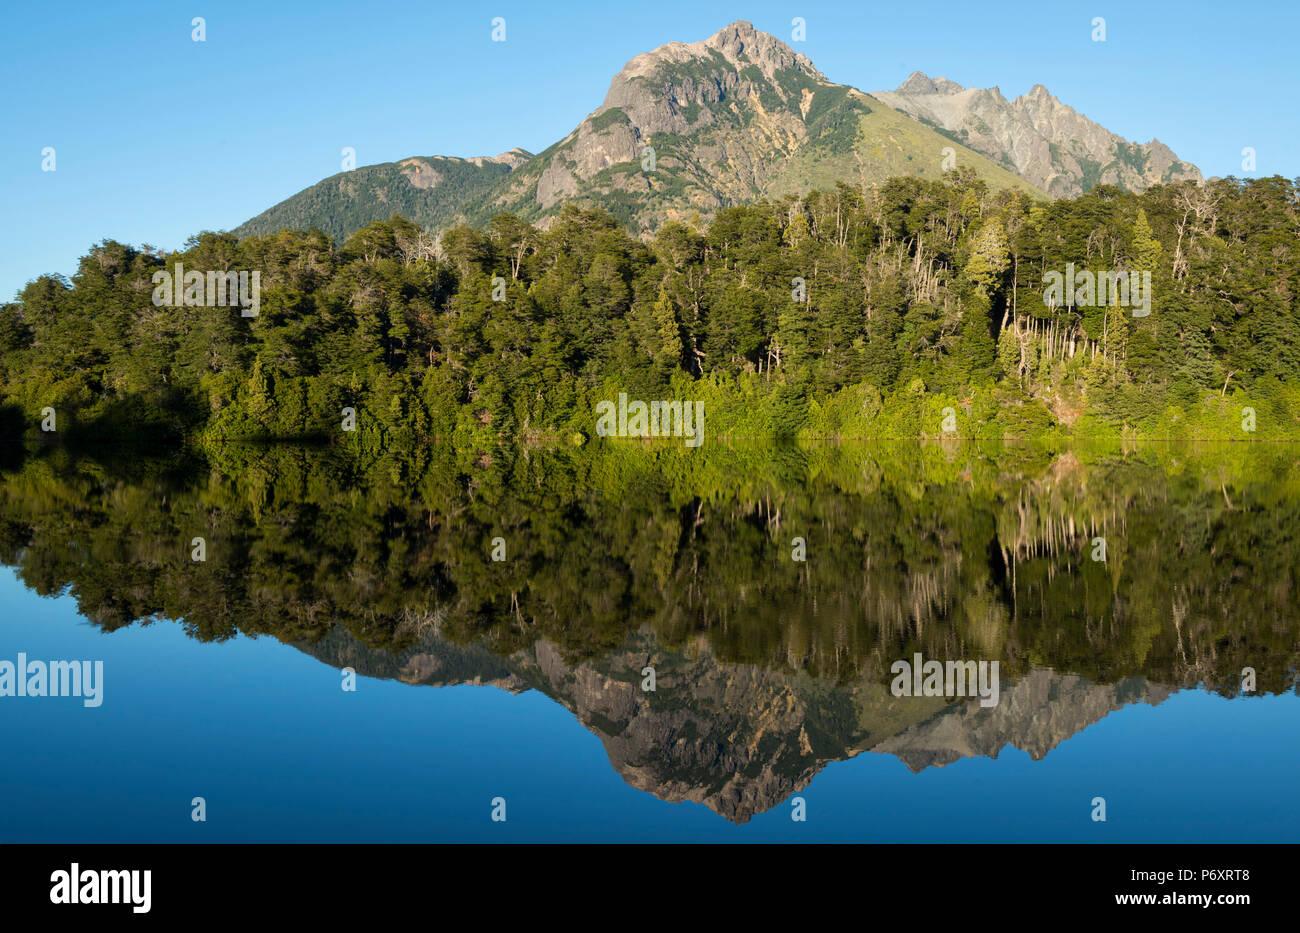 Sud America, Argentina, Patagonia, Rio Negro, Nahuel Huapi National Park, Lago Escondido Immagini Stock